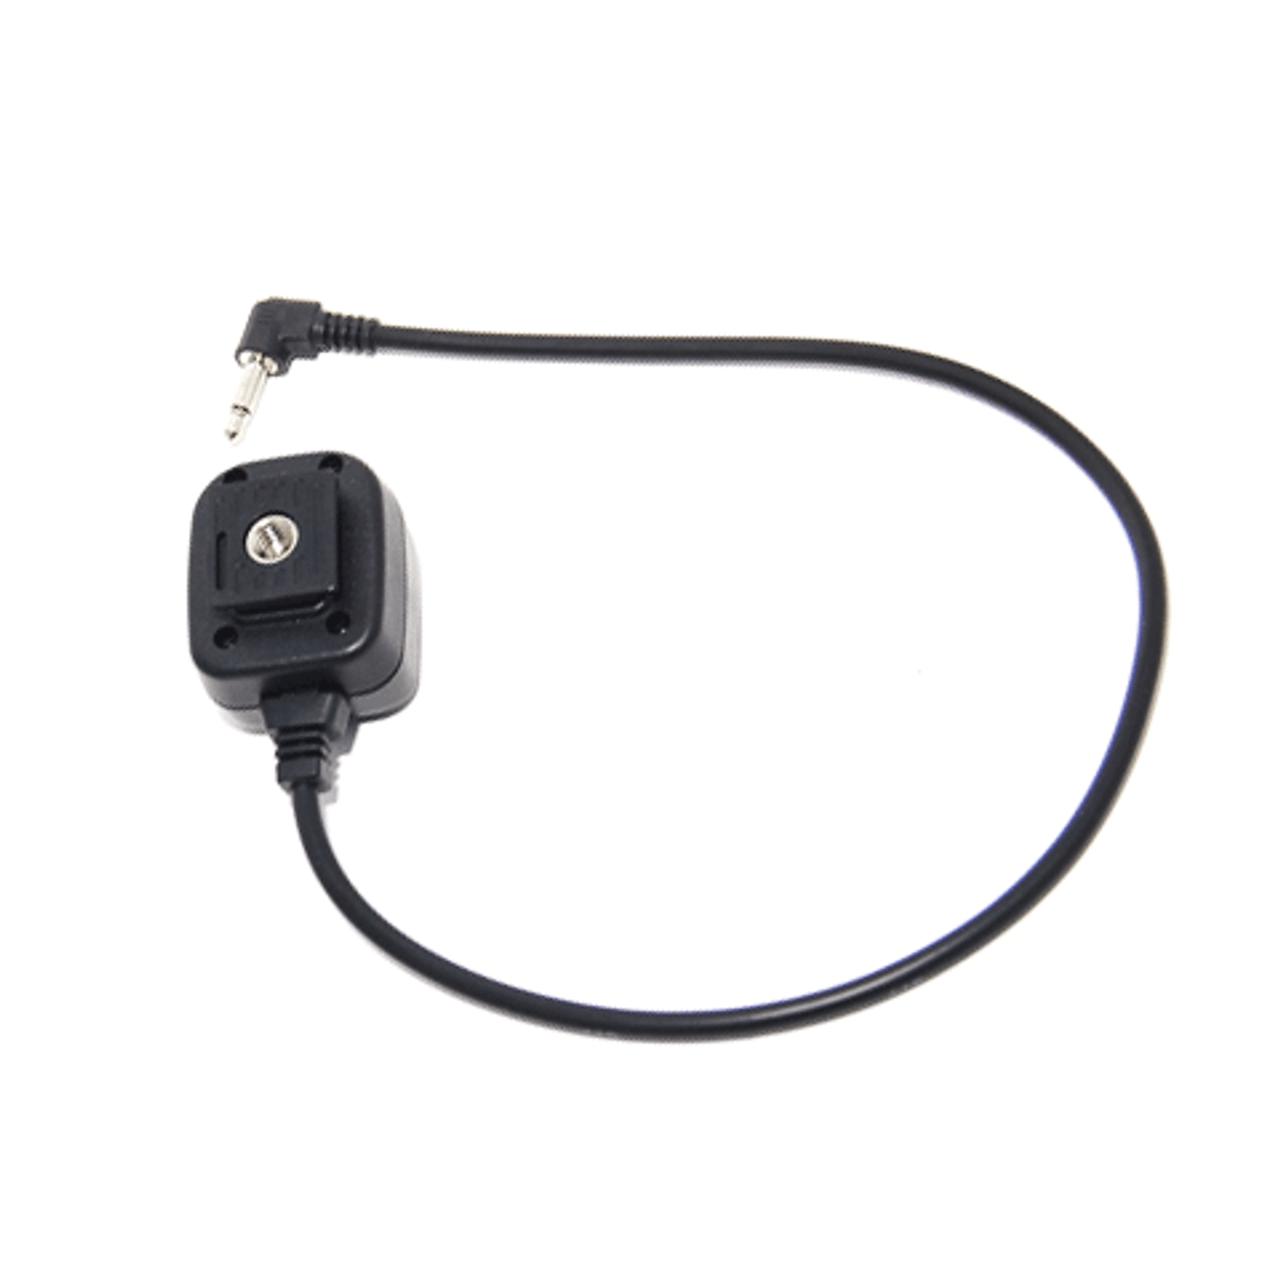 JJC PW-X2 Monoplug to Female Hot Shoe Cord